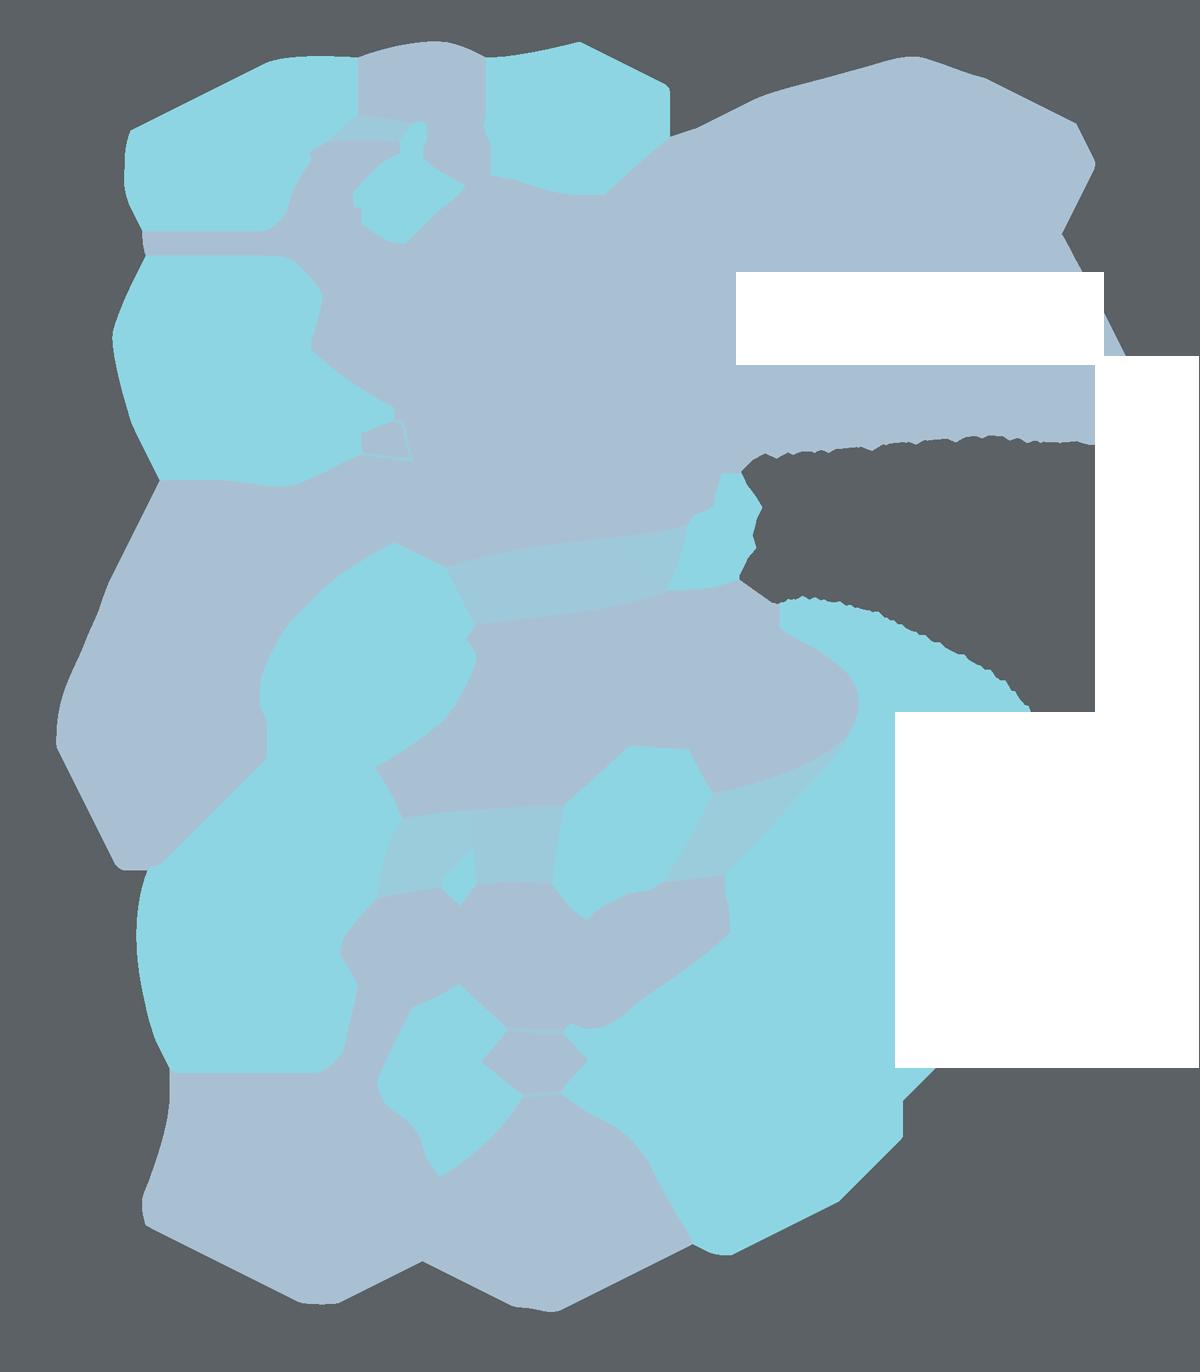 Improvisational Dance Business Logo Design by yoyodesign